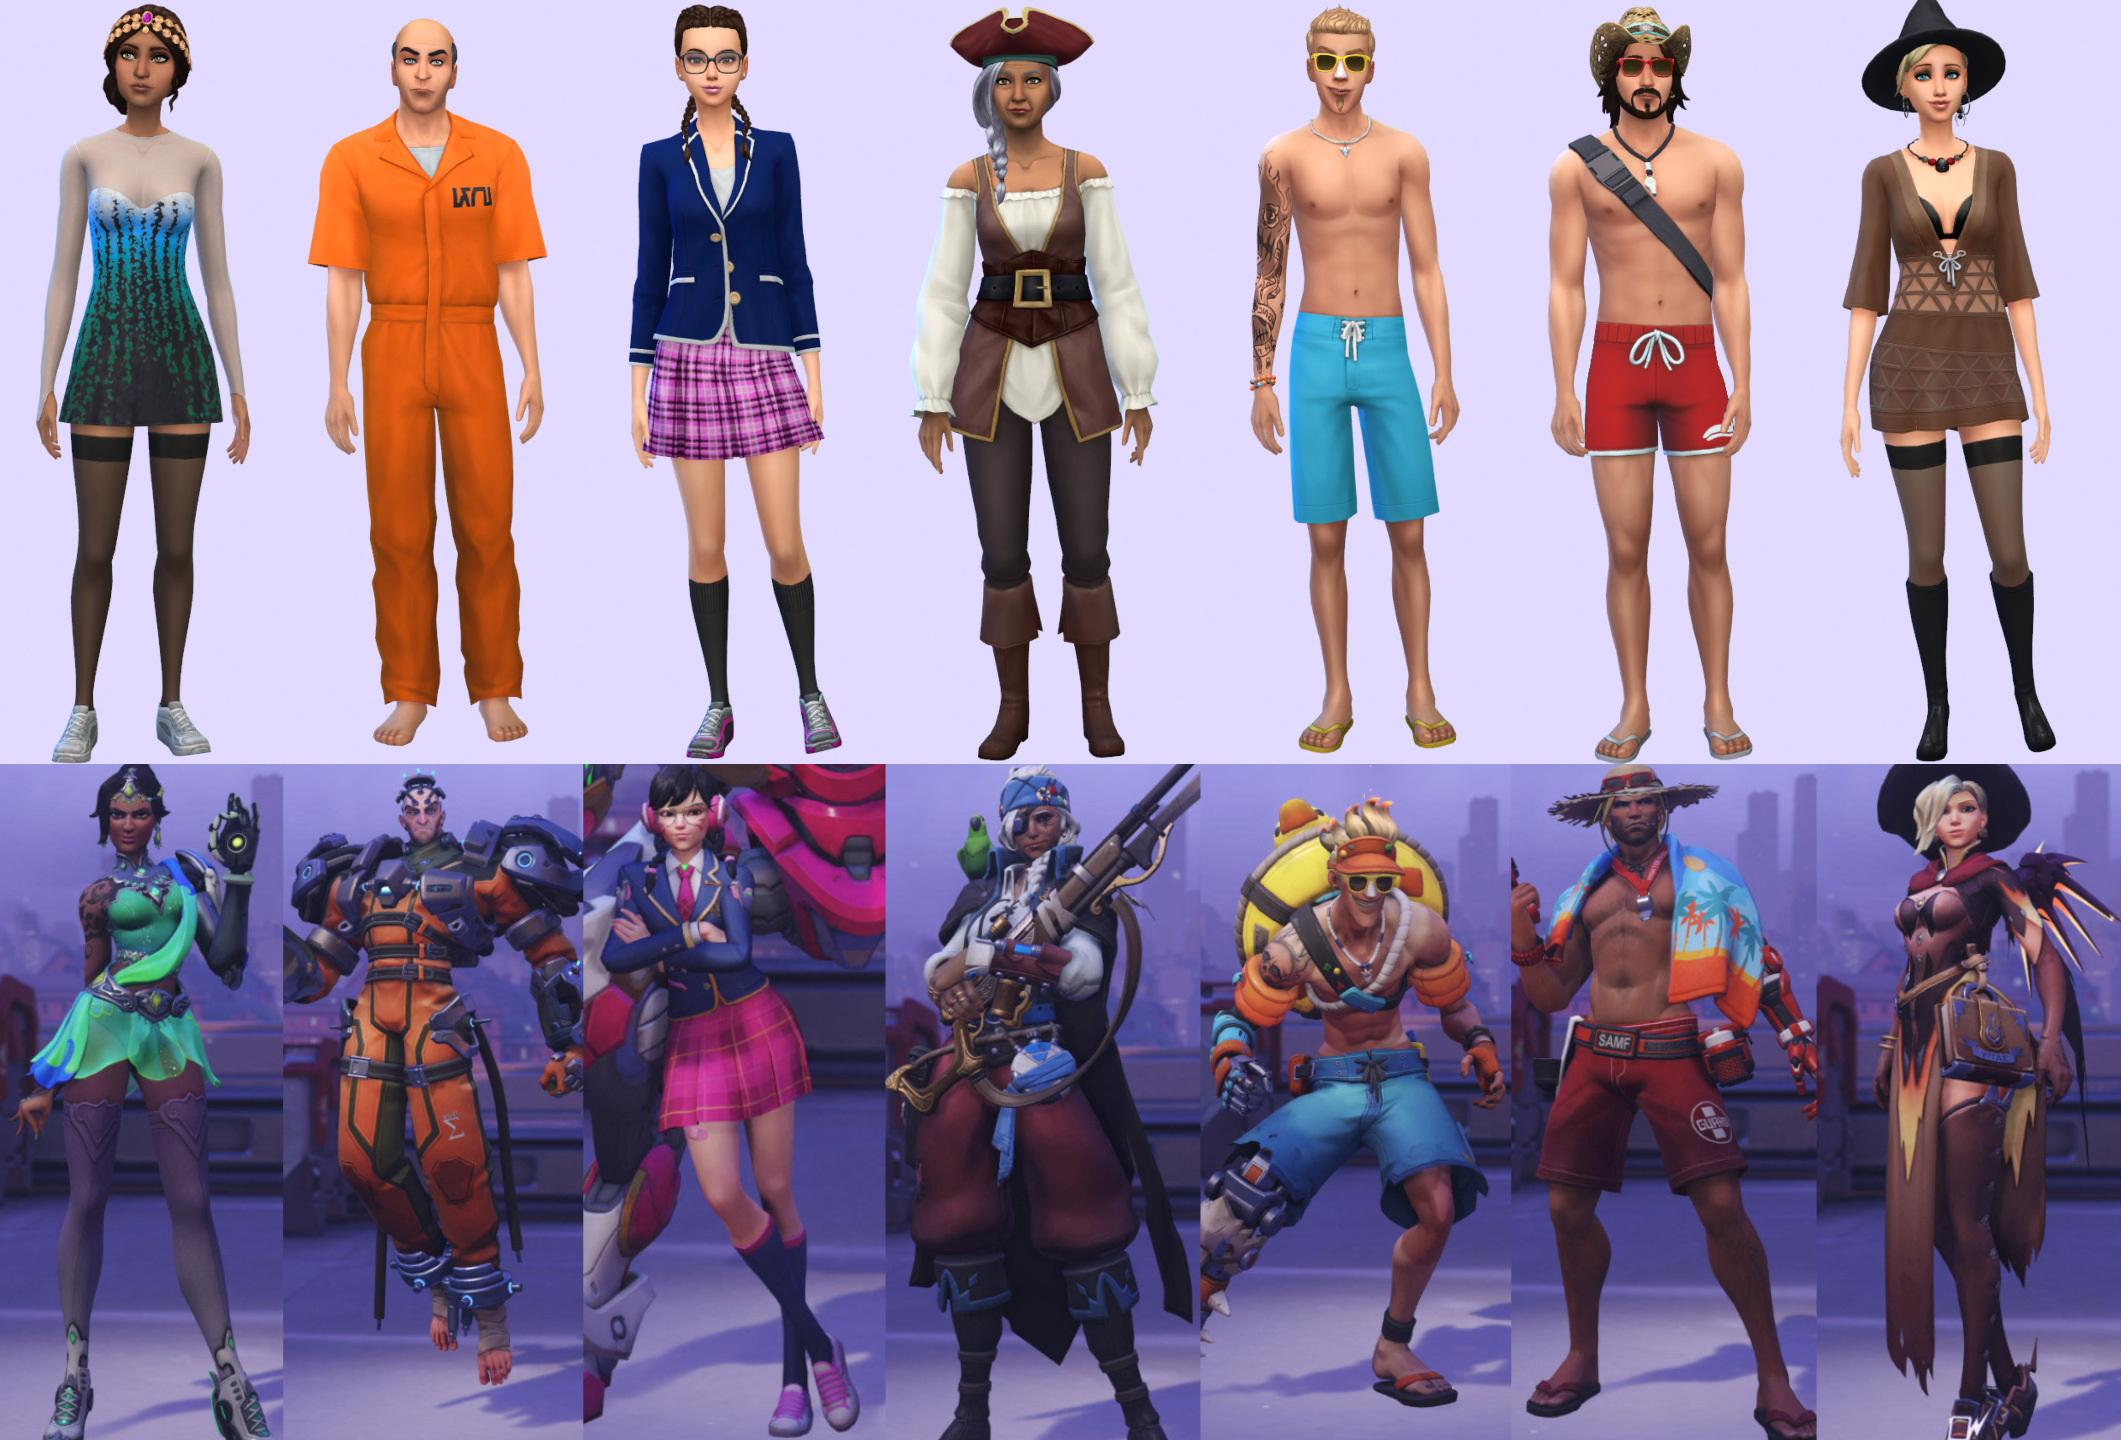 ModTheSims/LaLuvi/Blizzard Entertainment